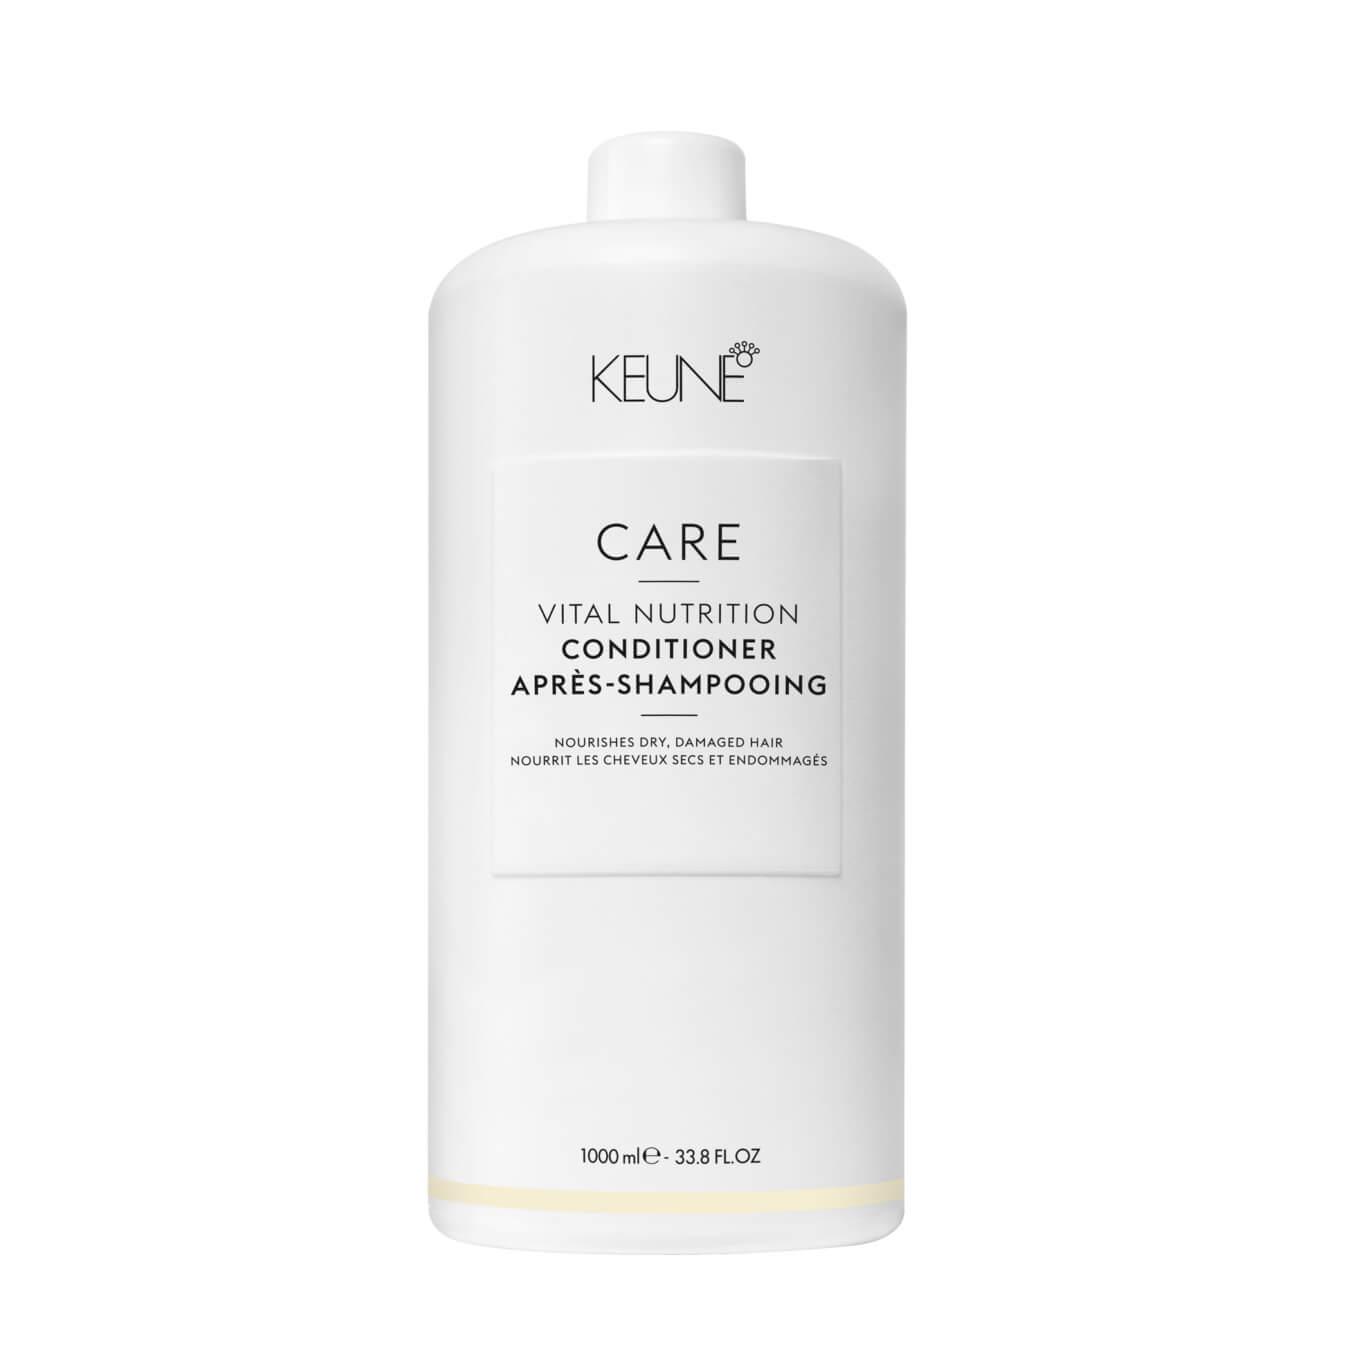 Kauf Keune Care Vital Nutrition Conditioner 1000ml